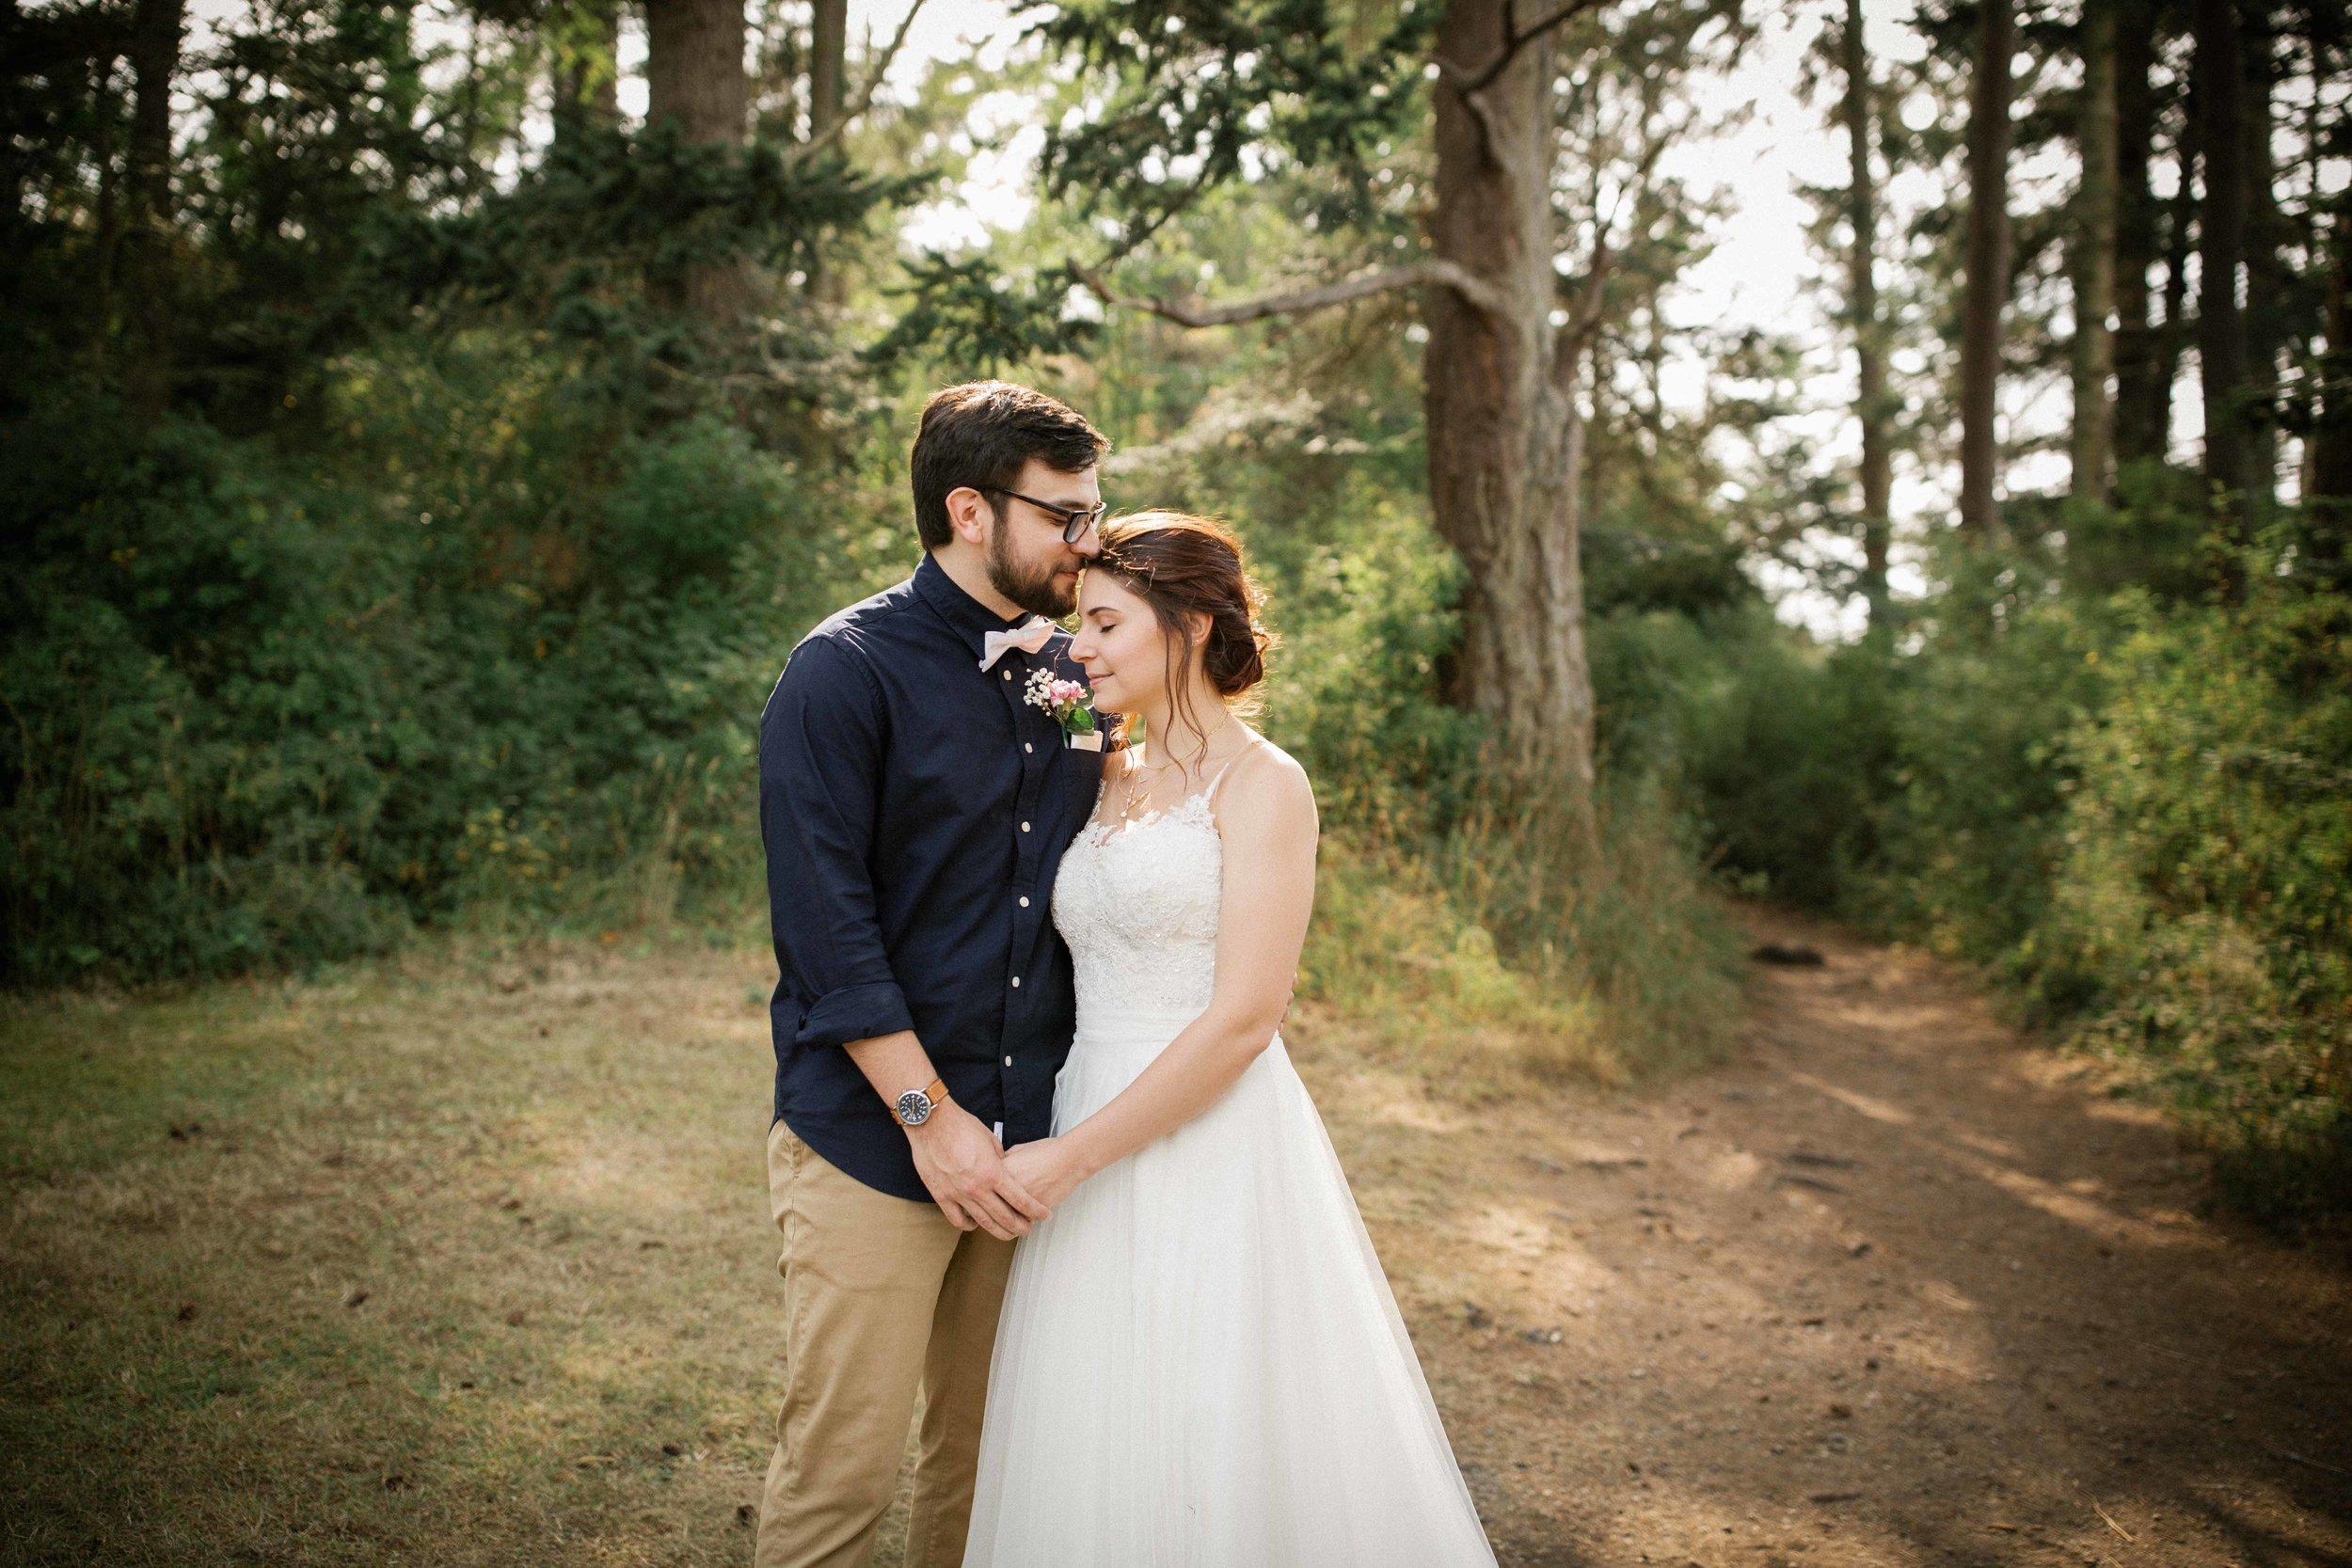 deception-pass-wedding-53.jpg